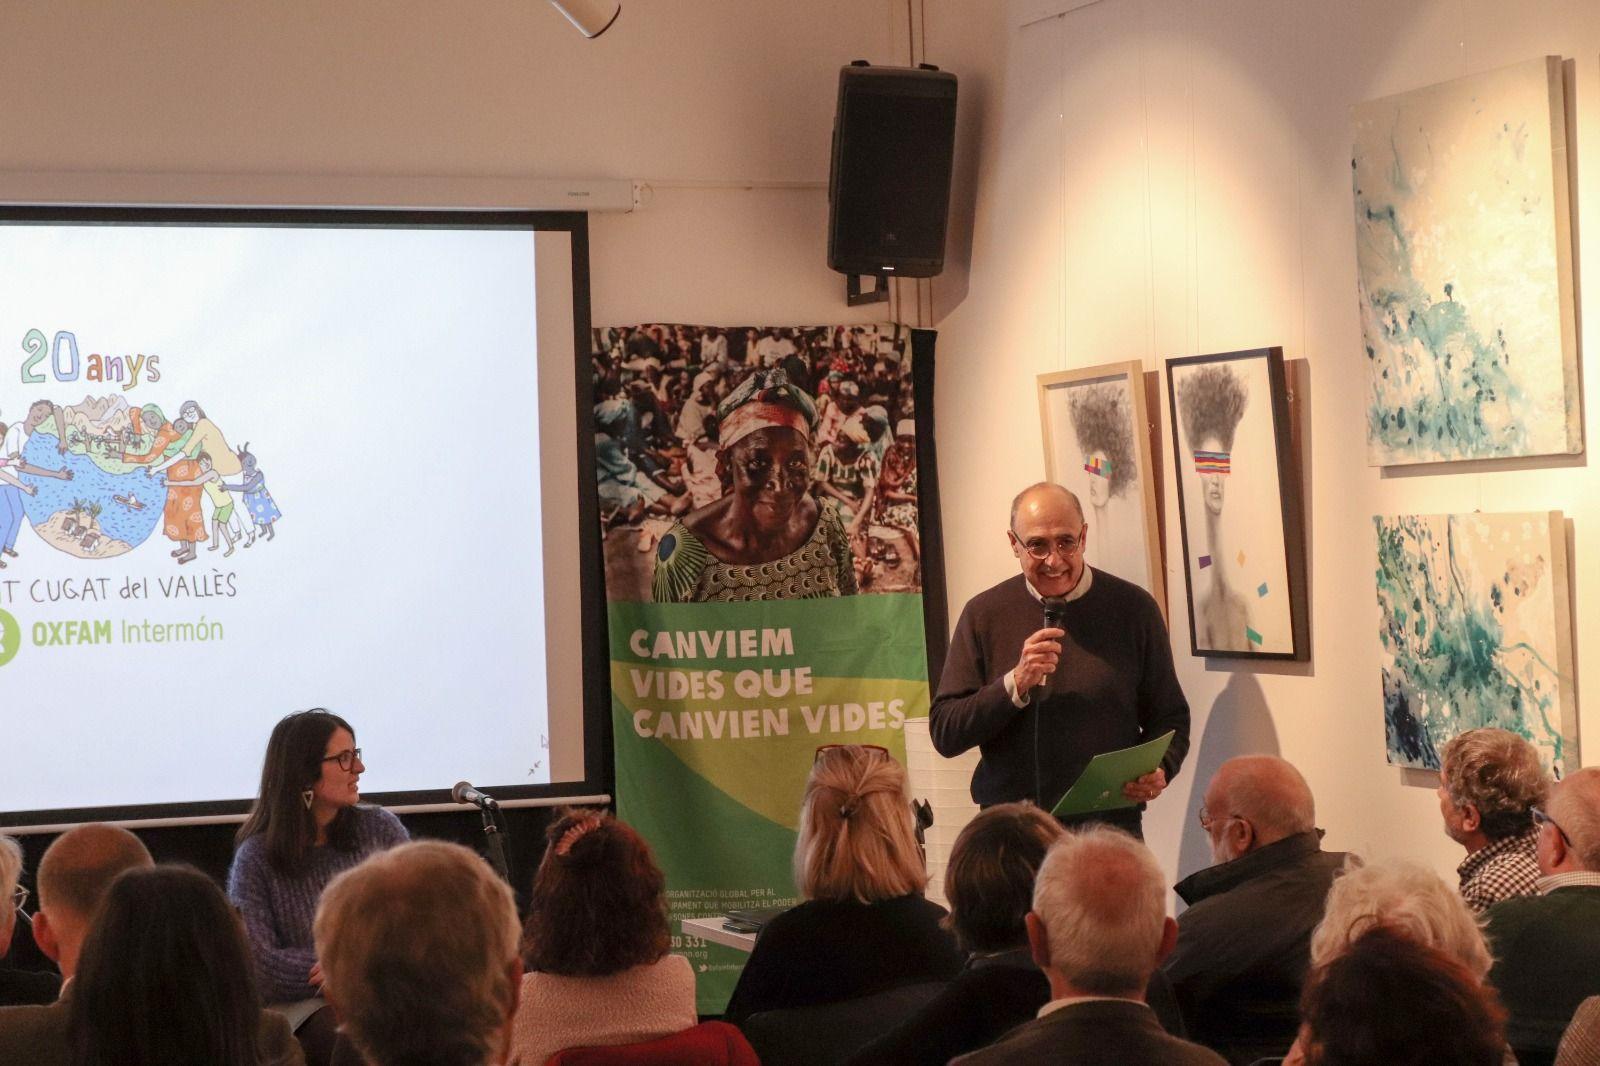 Acte Ateneu Desigualtats Intermon Oxfam. FOTO: Cedida